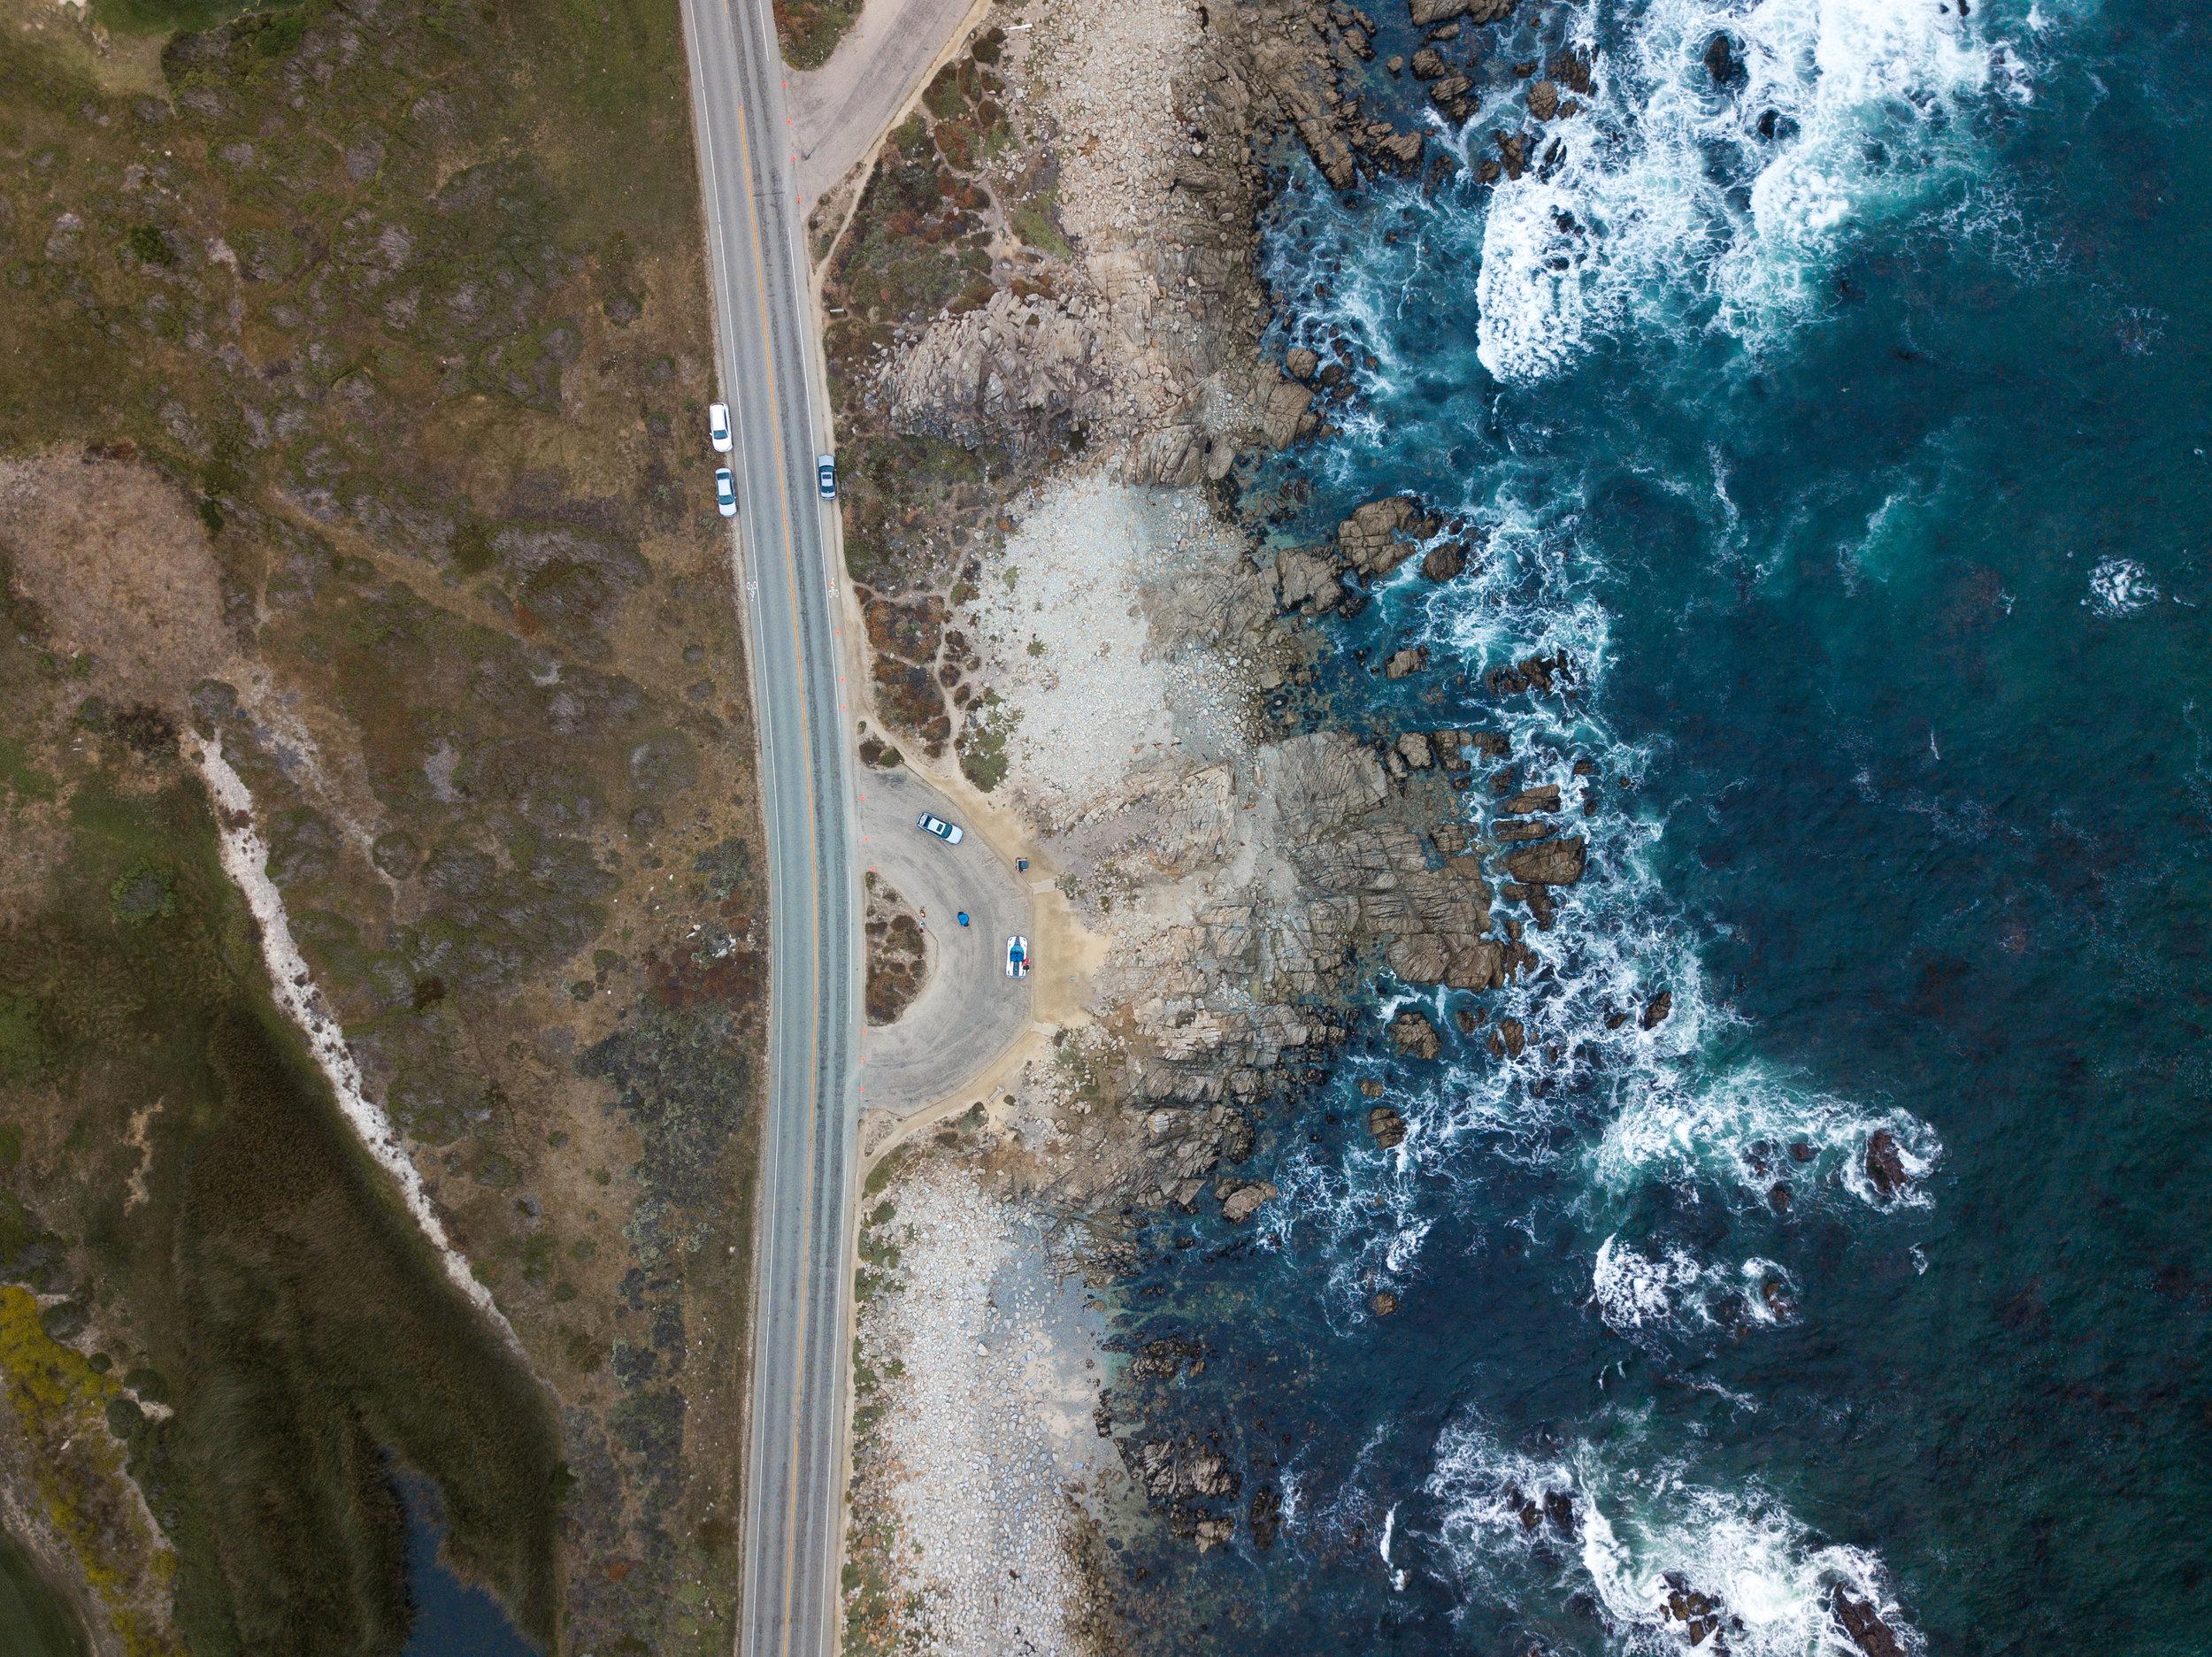 Stay_Driven_Monterey_Car_Week_Koenigsegg_Drone-11.jpg